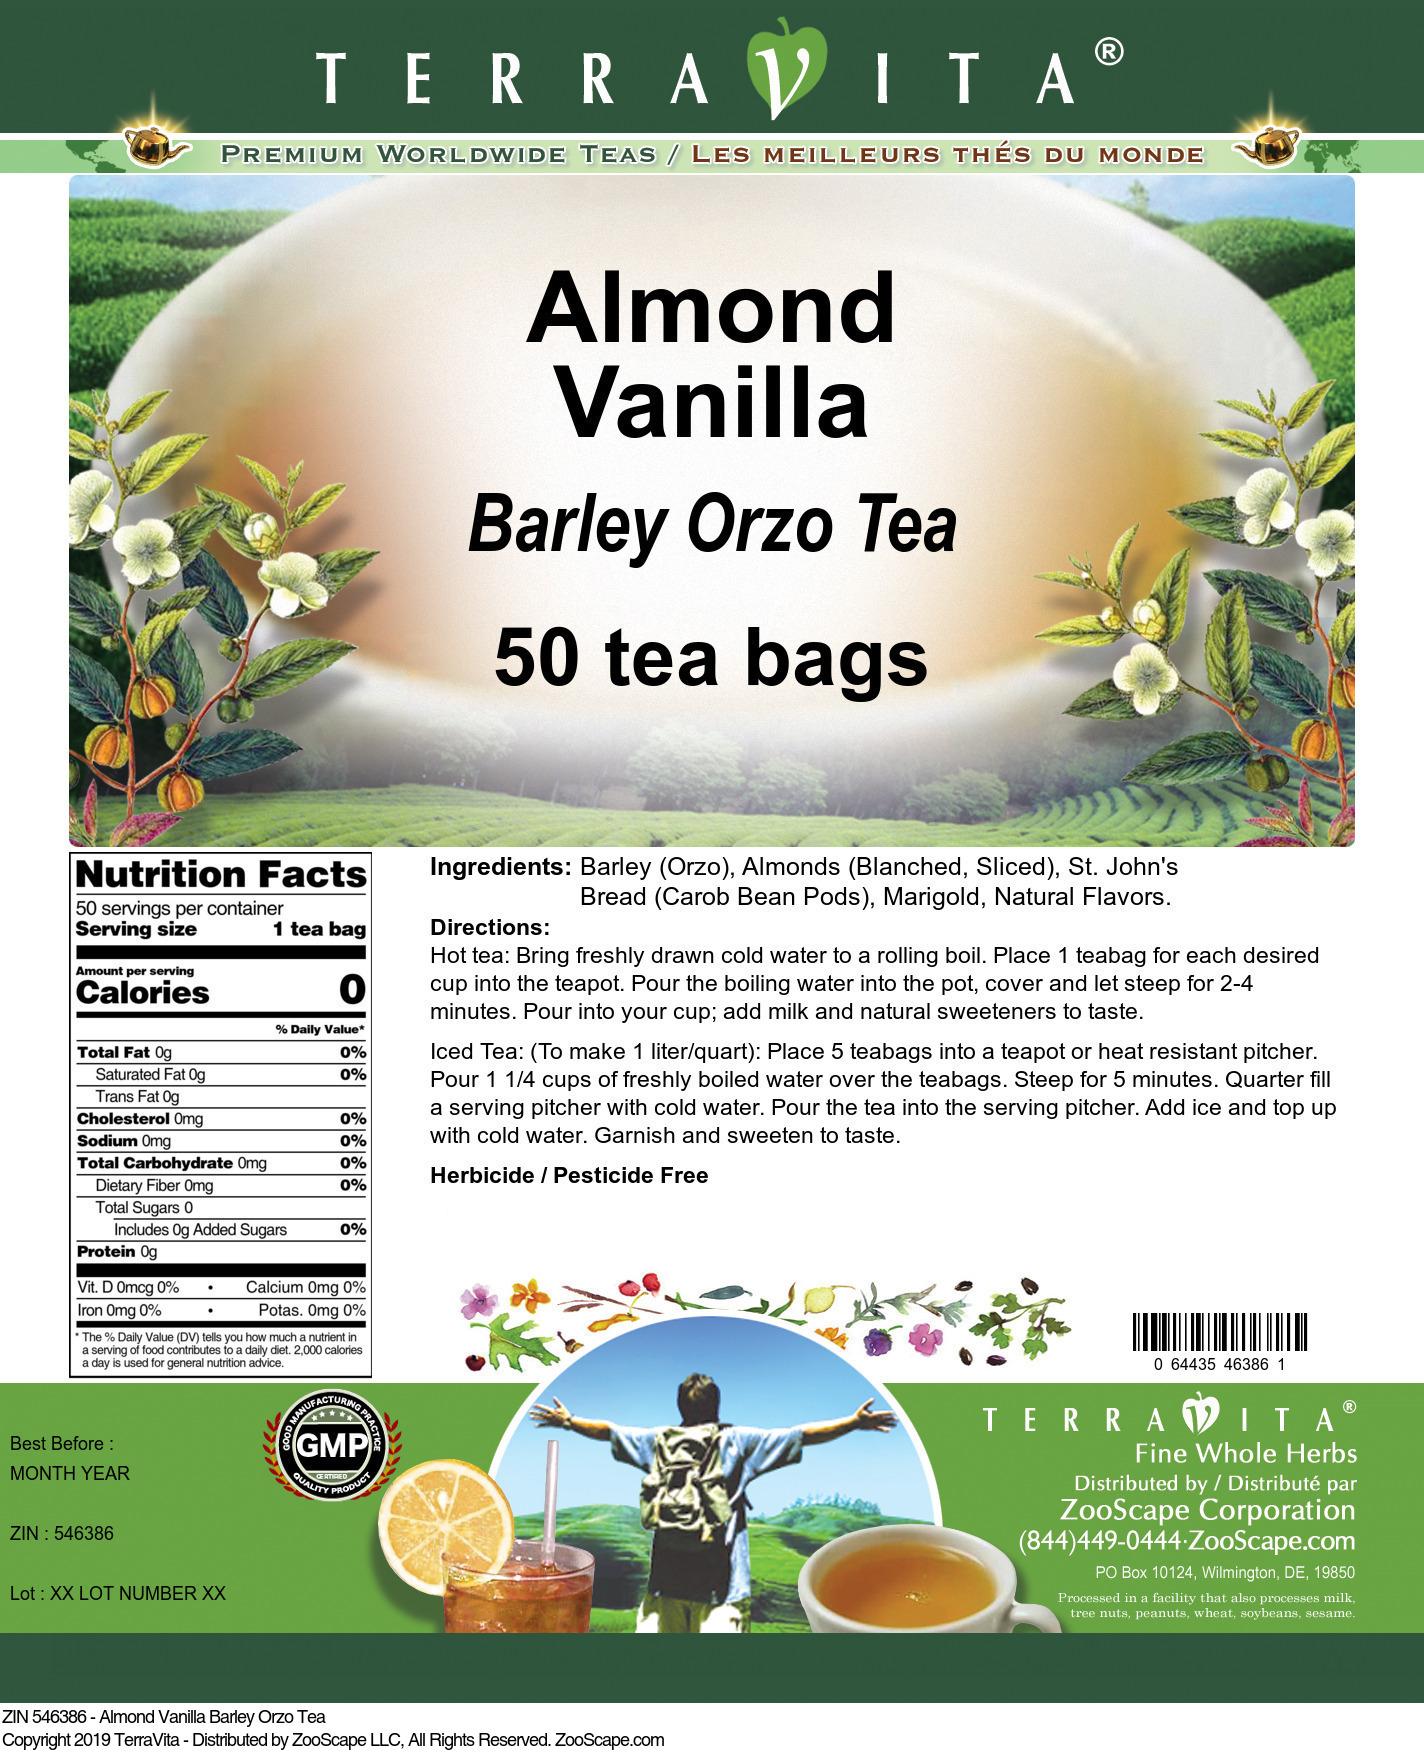 Almond Vanilla Barley Orzo